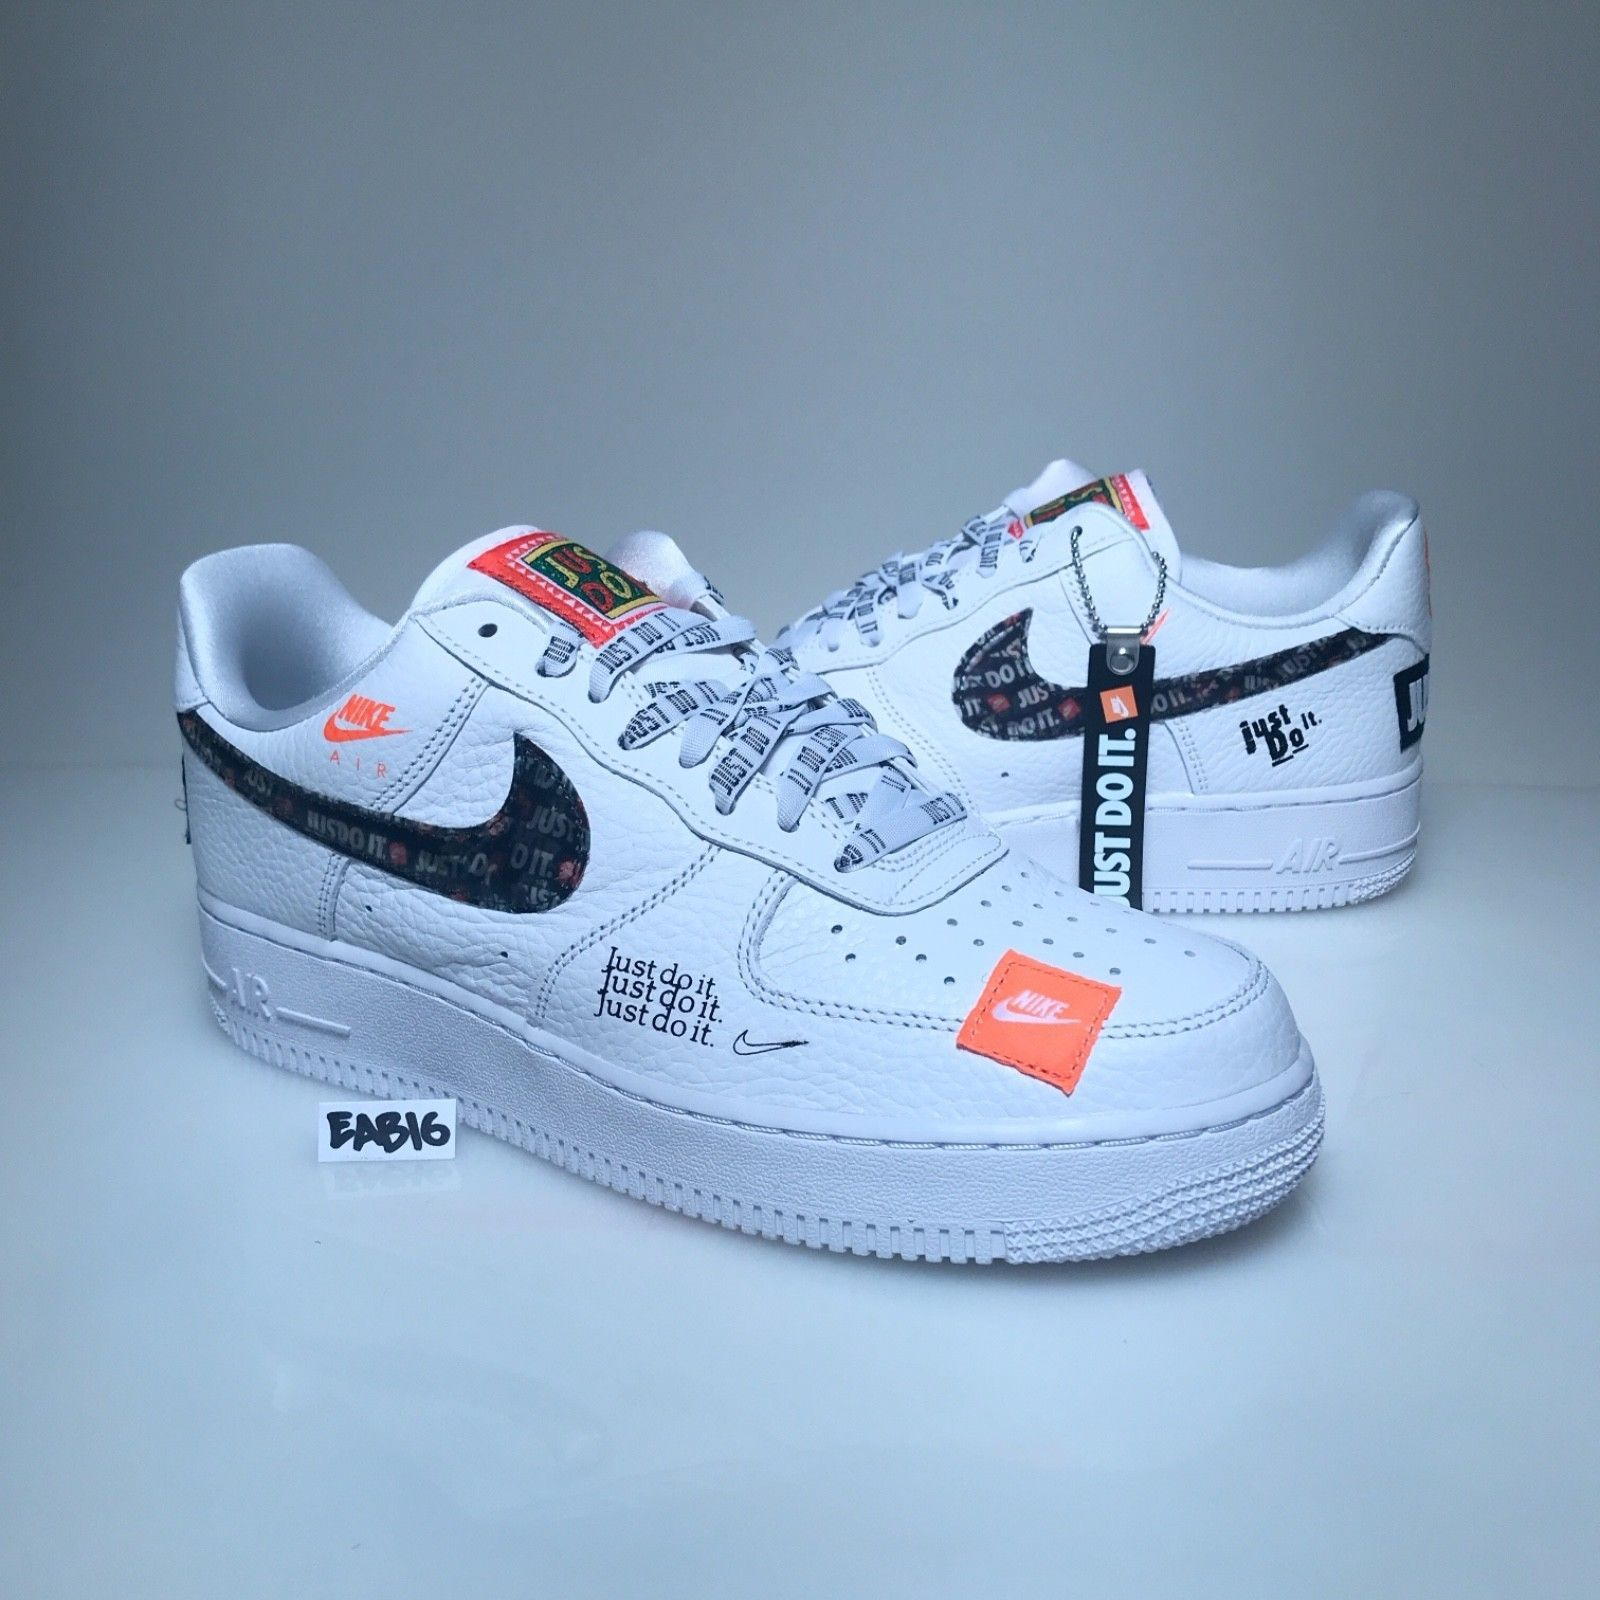 Nike Air Force 1 One Low 07 Prm Jdi Just Do It White Black Orange Af1 Ar7719 100 Nike Air Shoes Sneakers Nike Air Max Nike Air